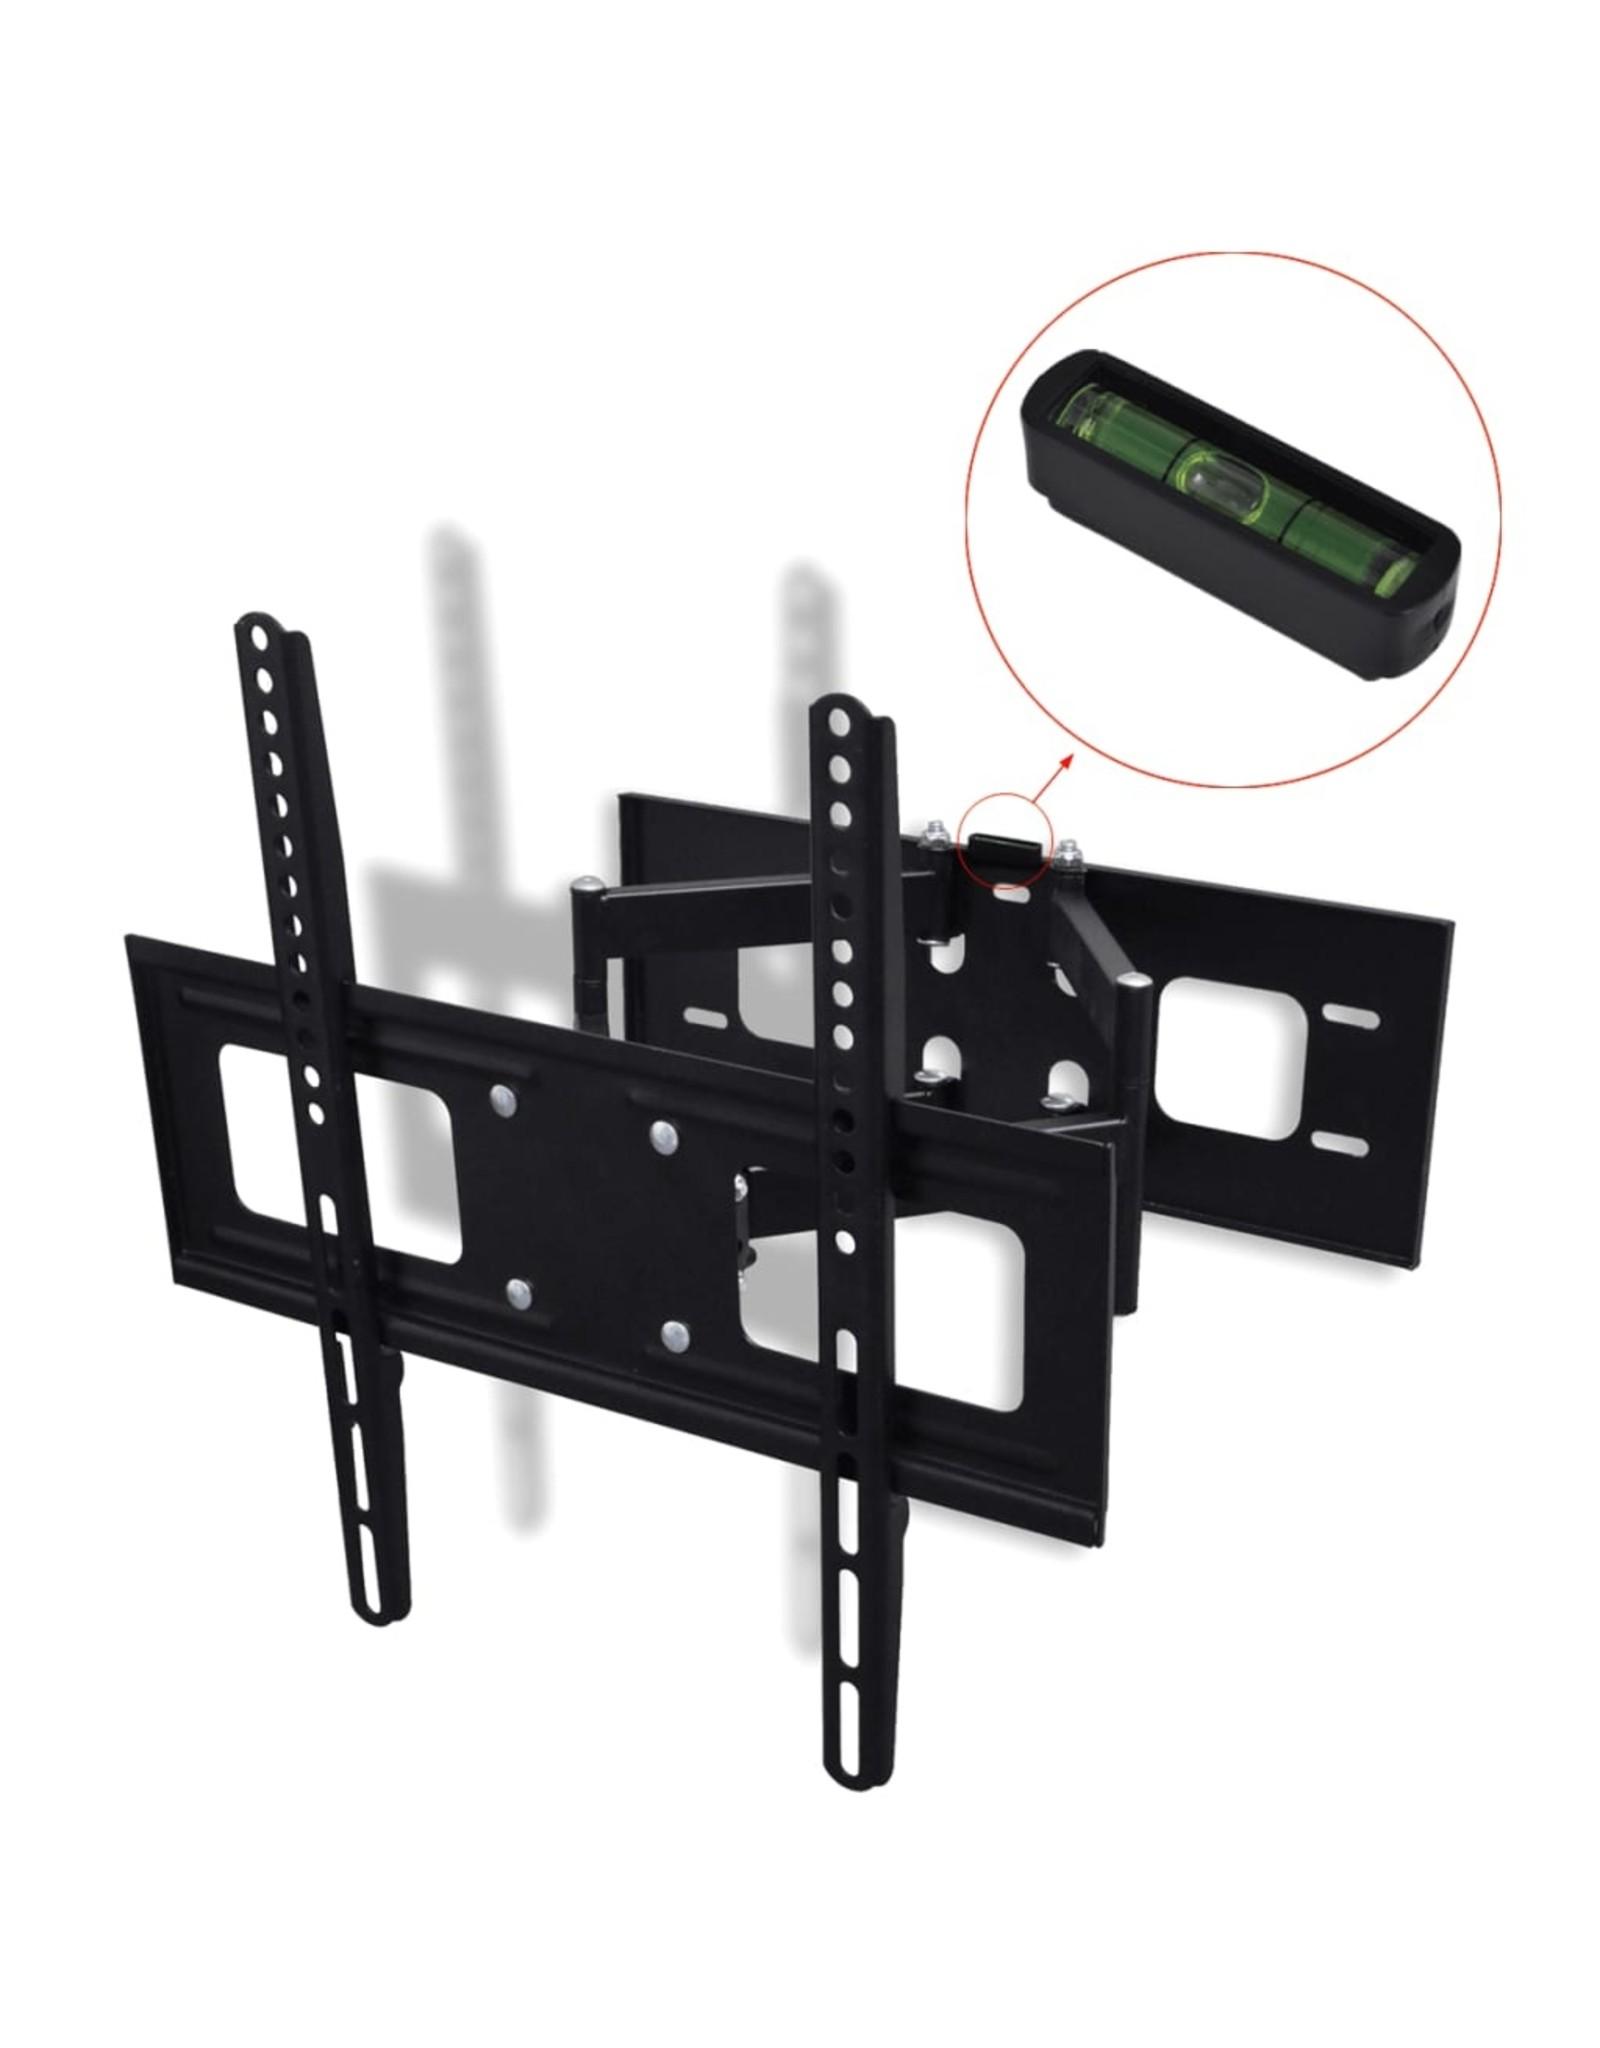 Tv-beugel dubbelarmig kantelen zwenken 3D 32''-55'' 400x400 mm